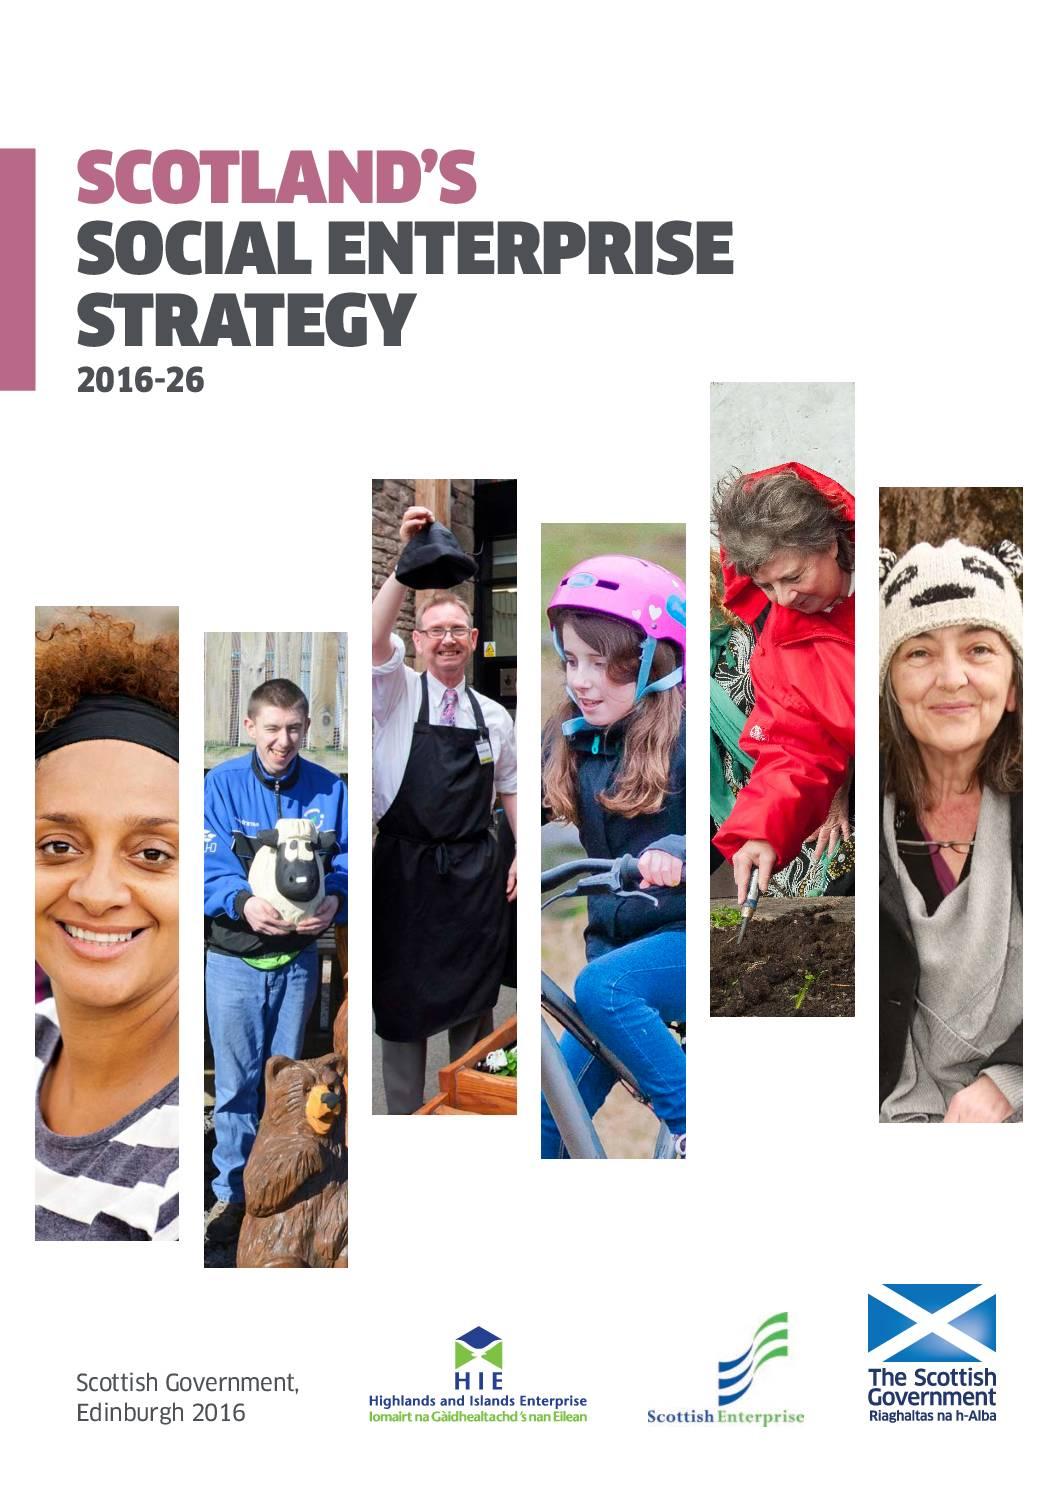 Scotland's Ten Year Social Enterprise Strategy